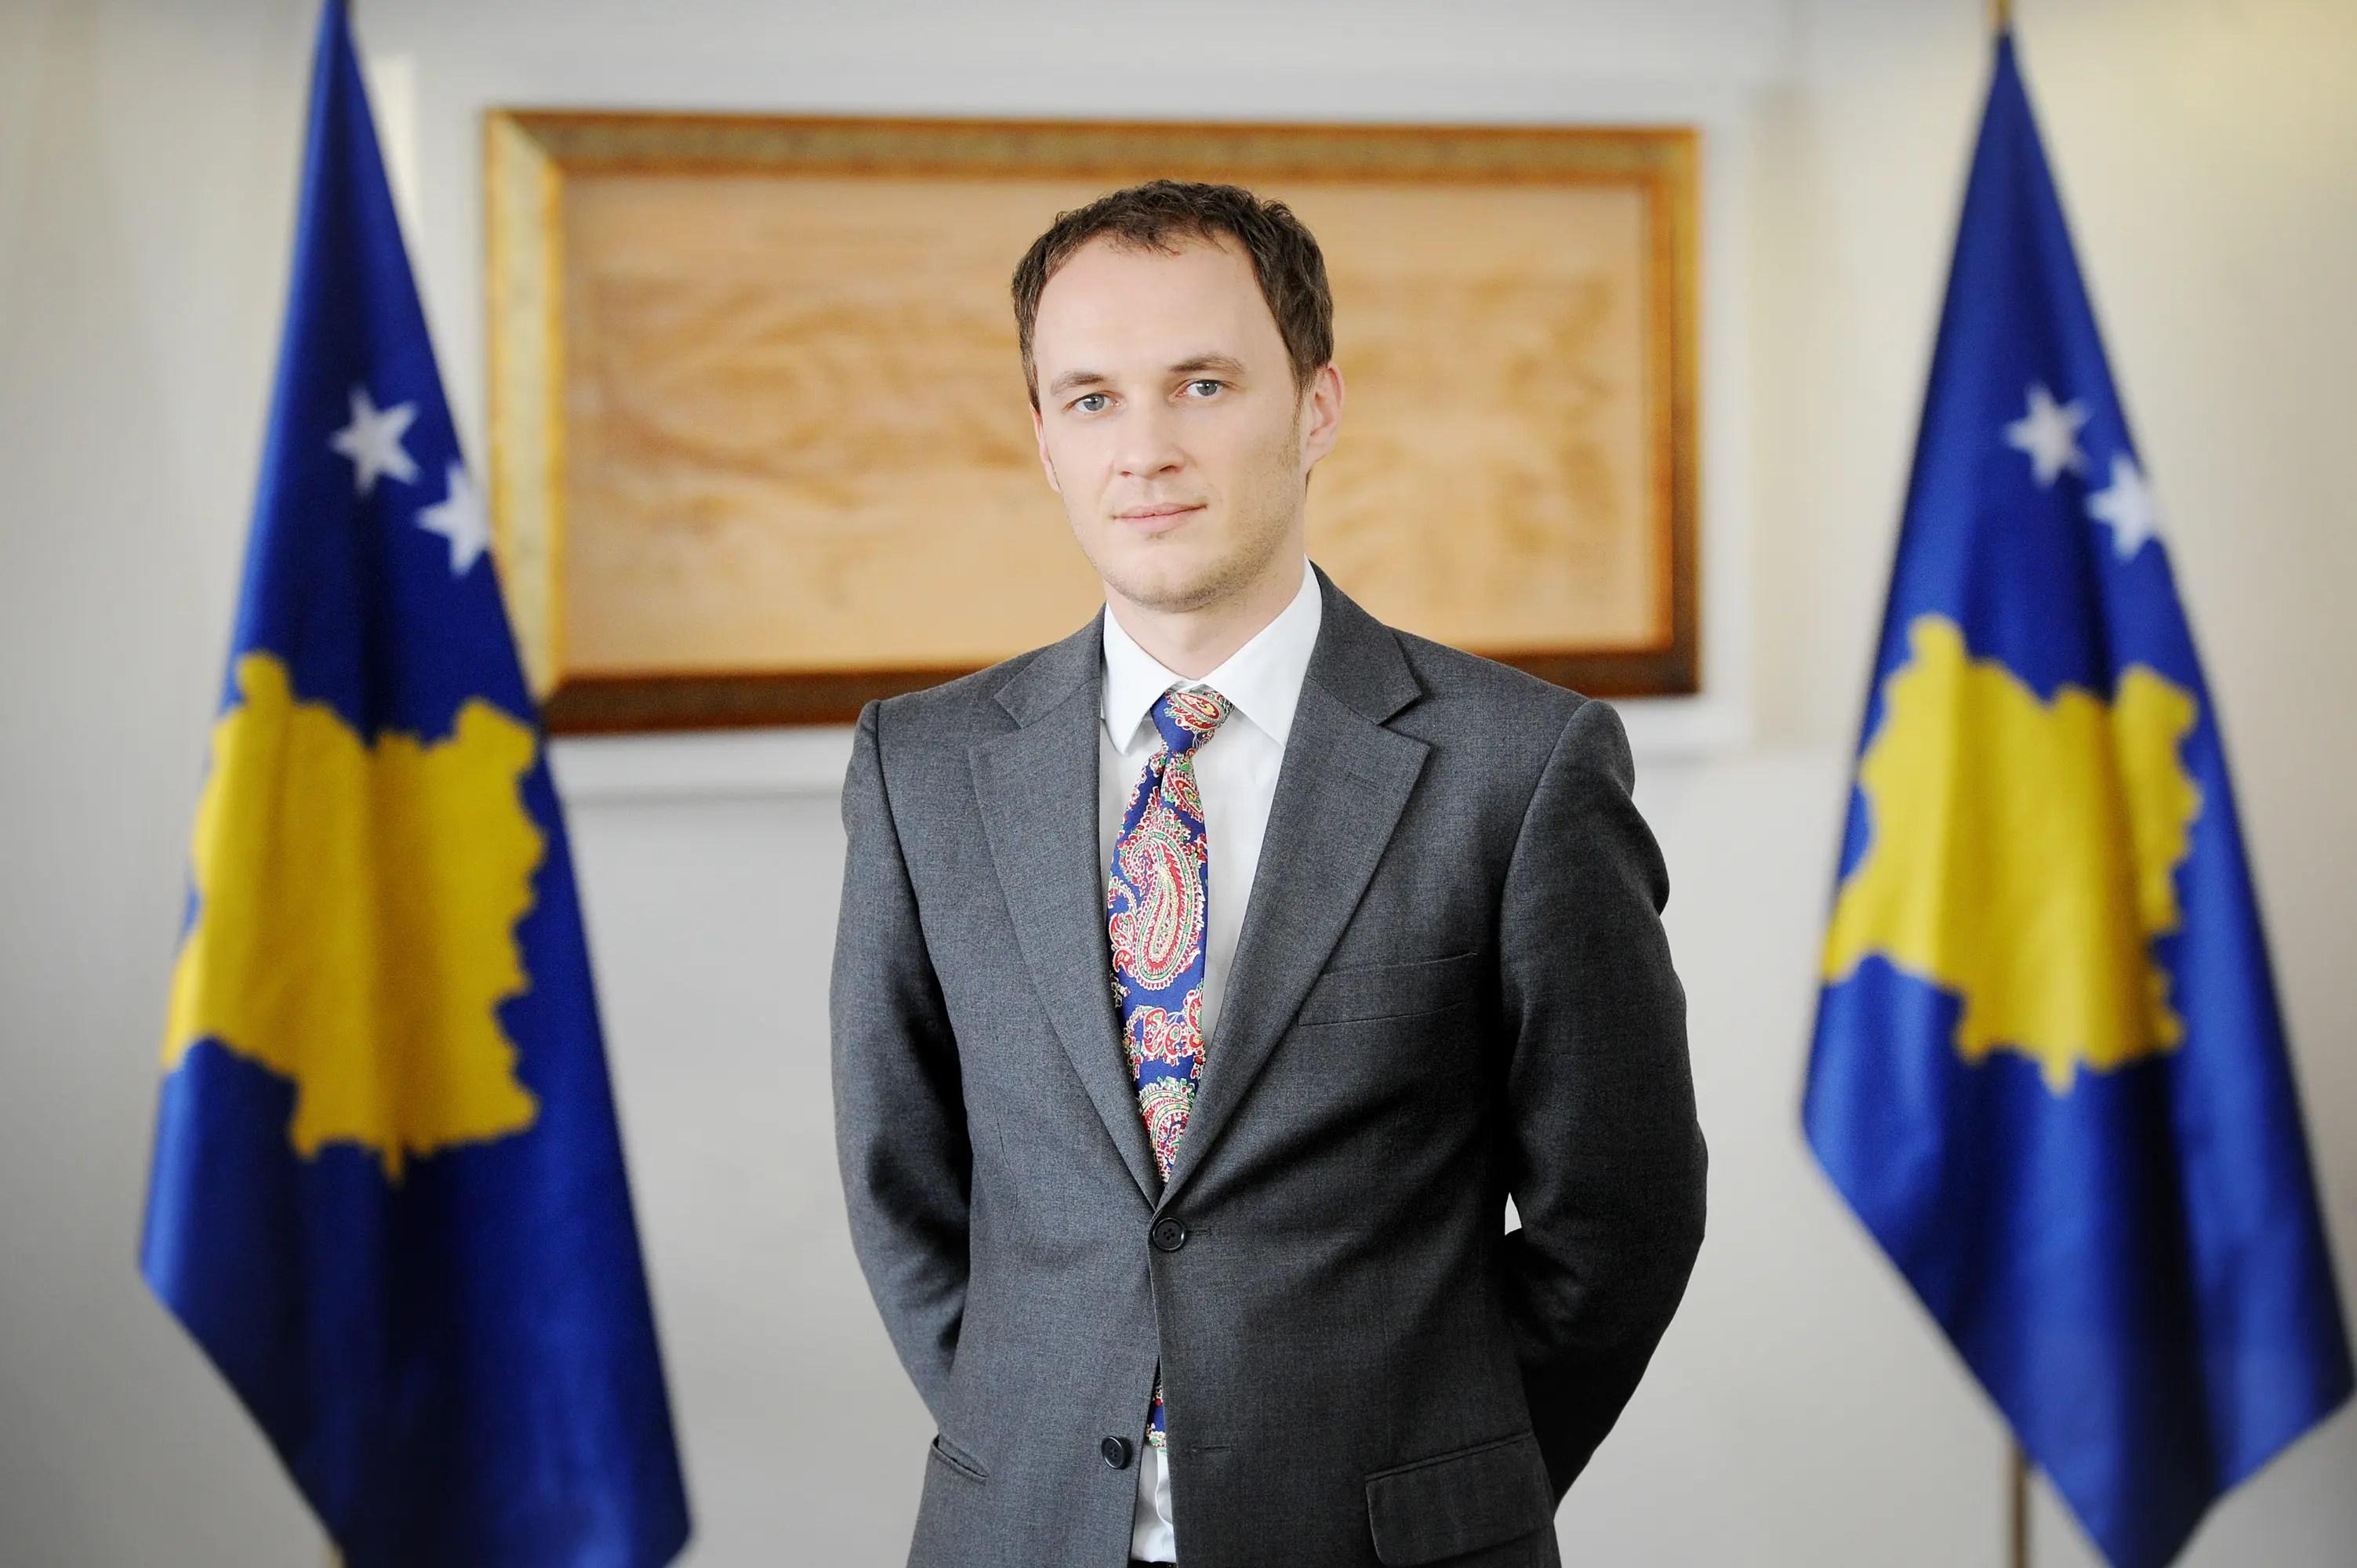 SelimiOnKosovo: Deputy Minister of Foreign Affairs Petrit Selimi